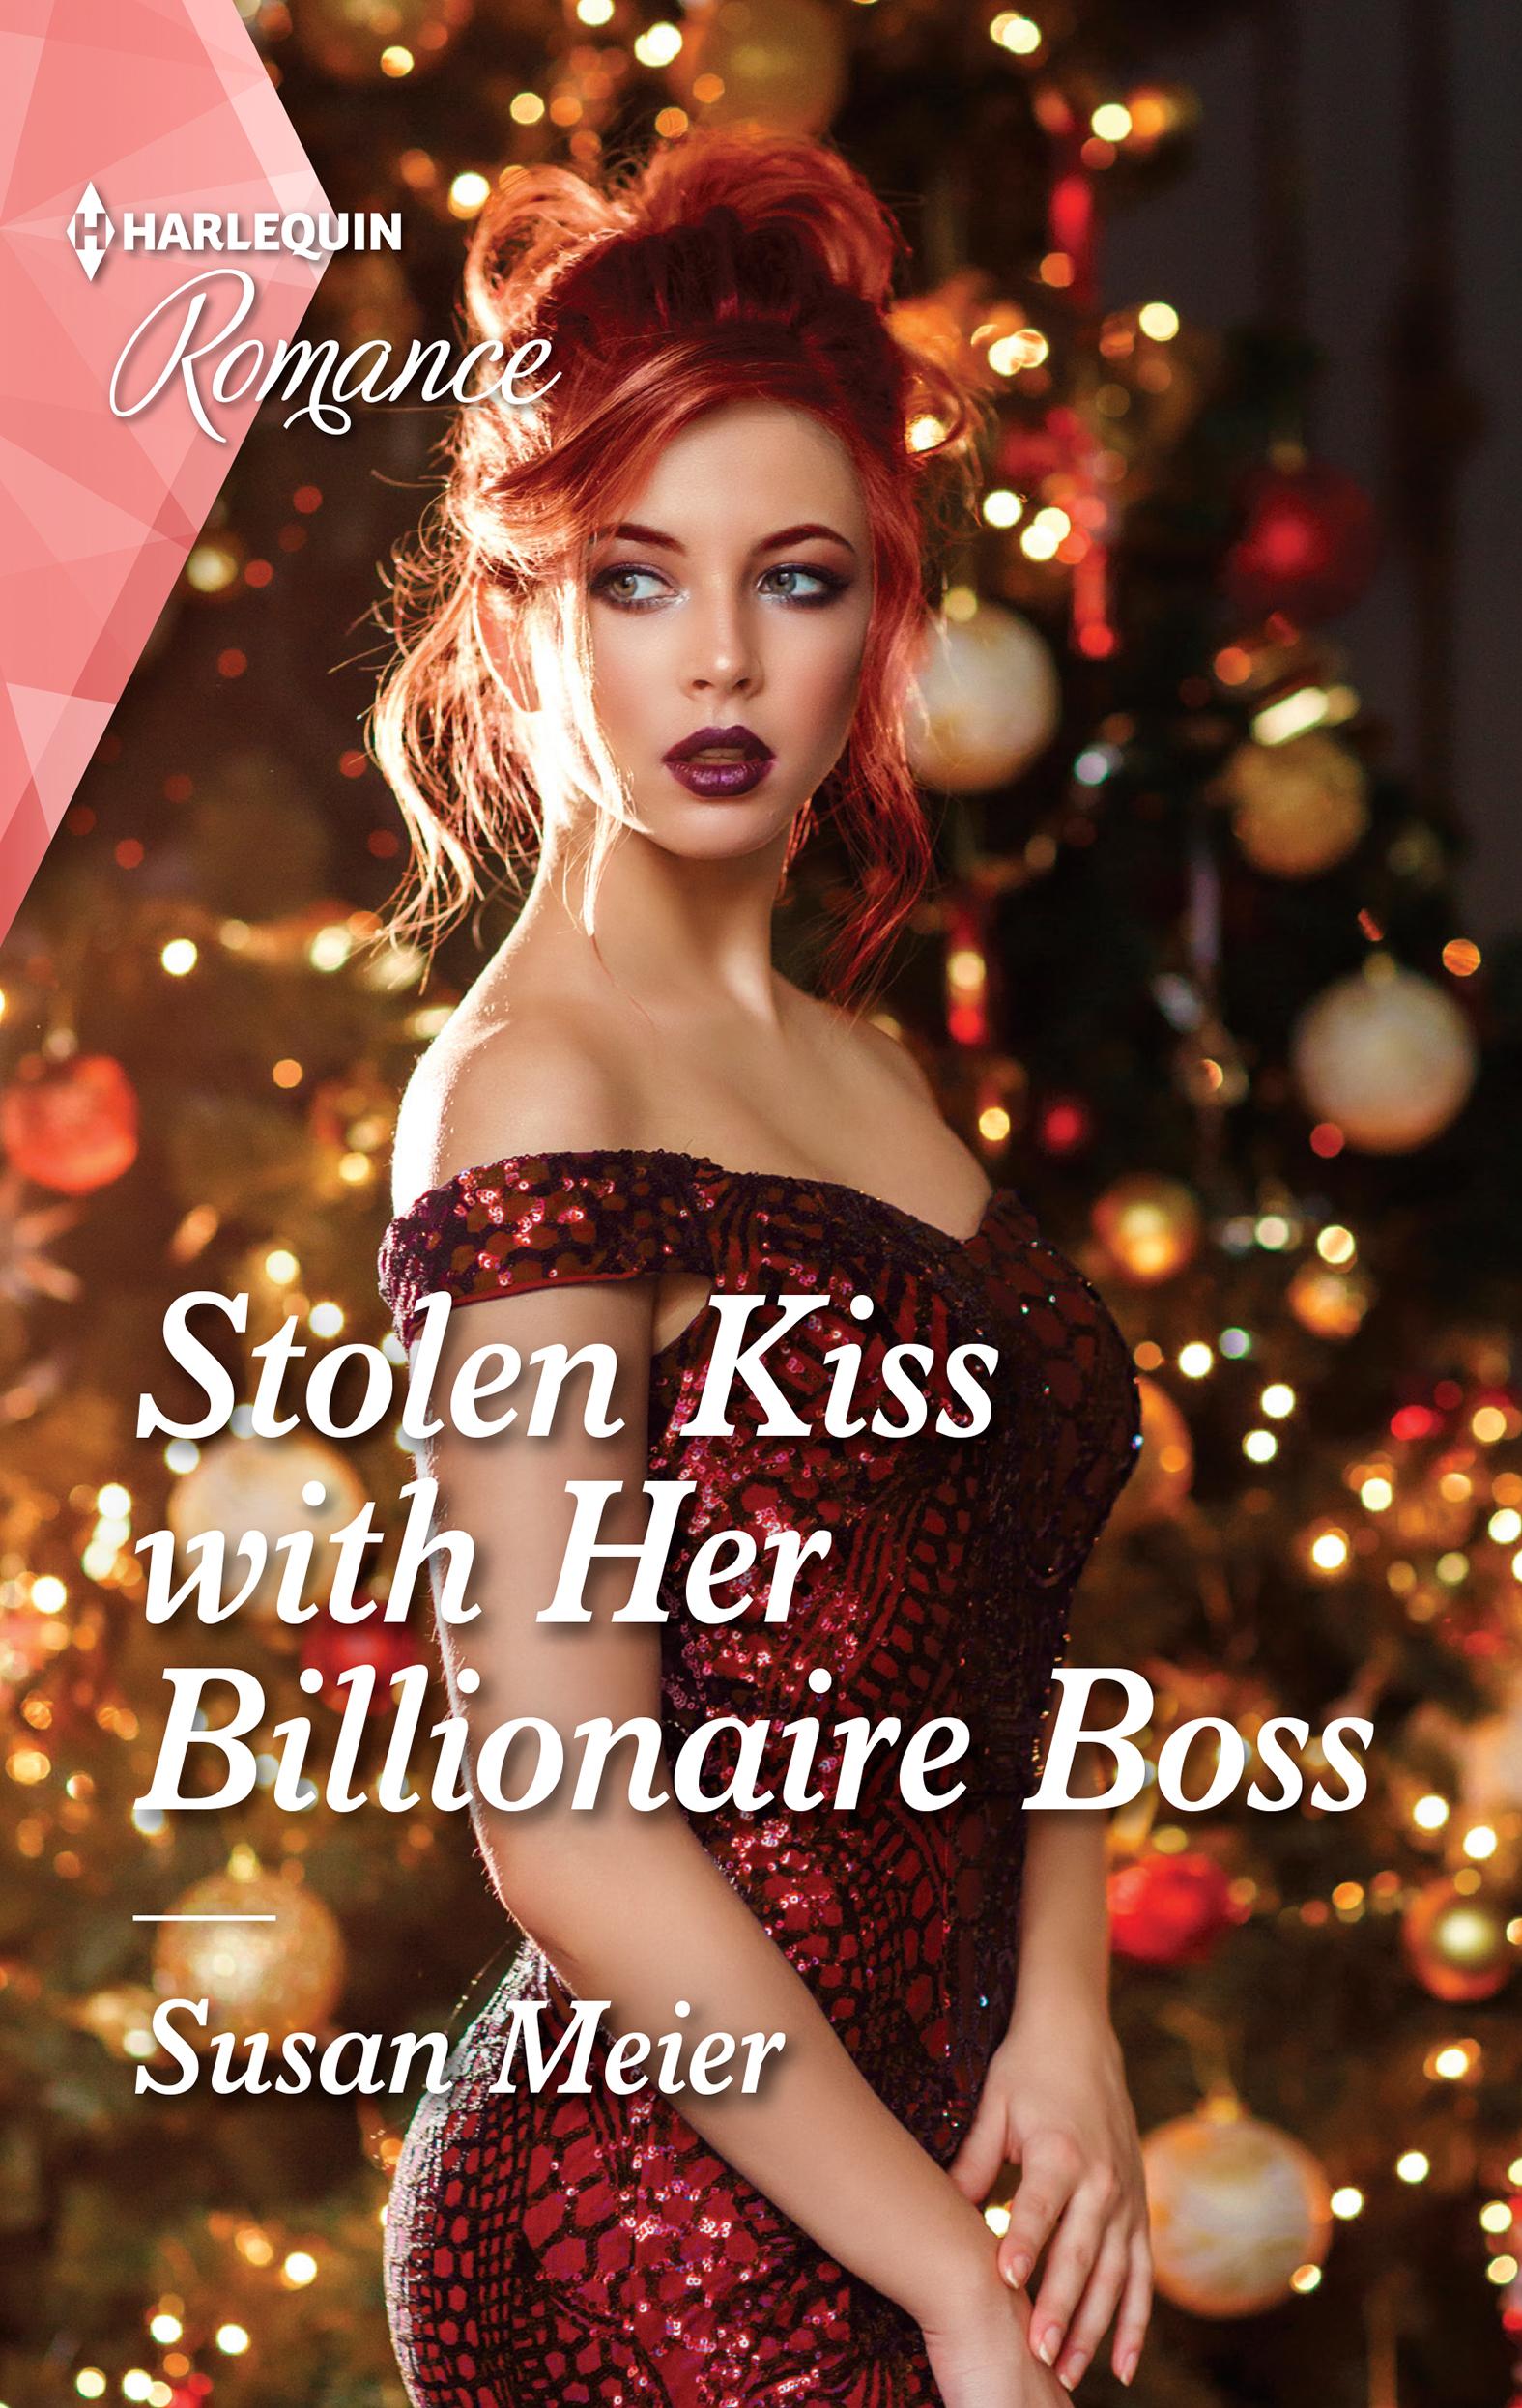 Stolen kiss with her Billionaire Boss Dec cover